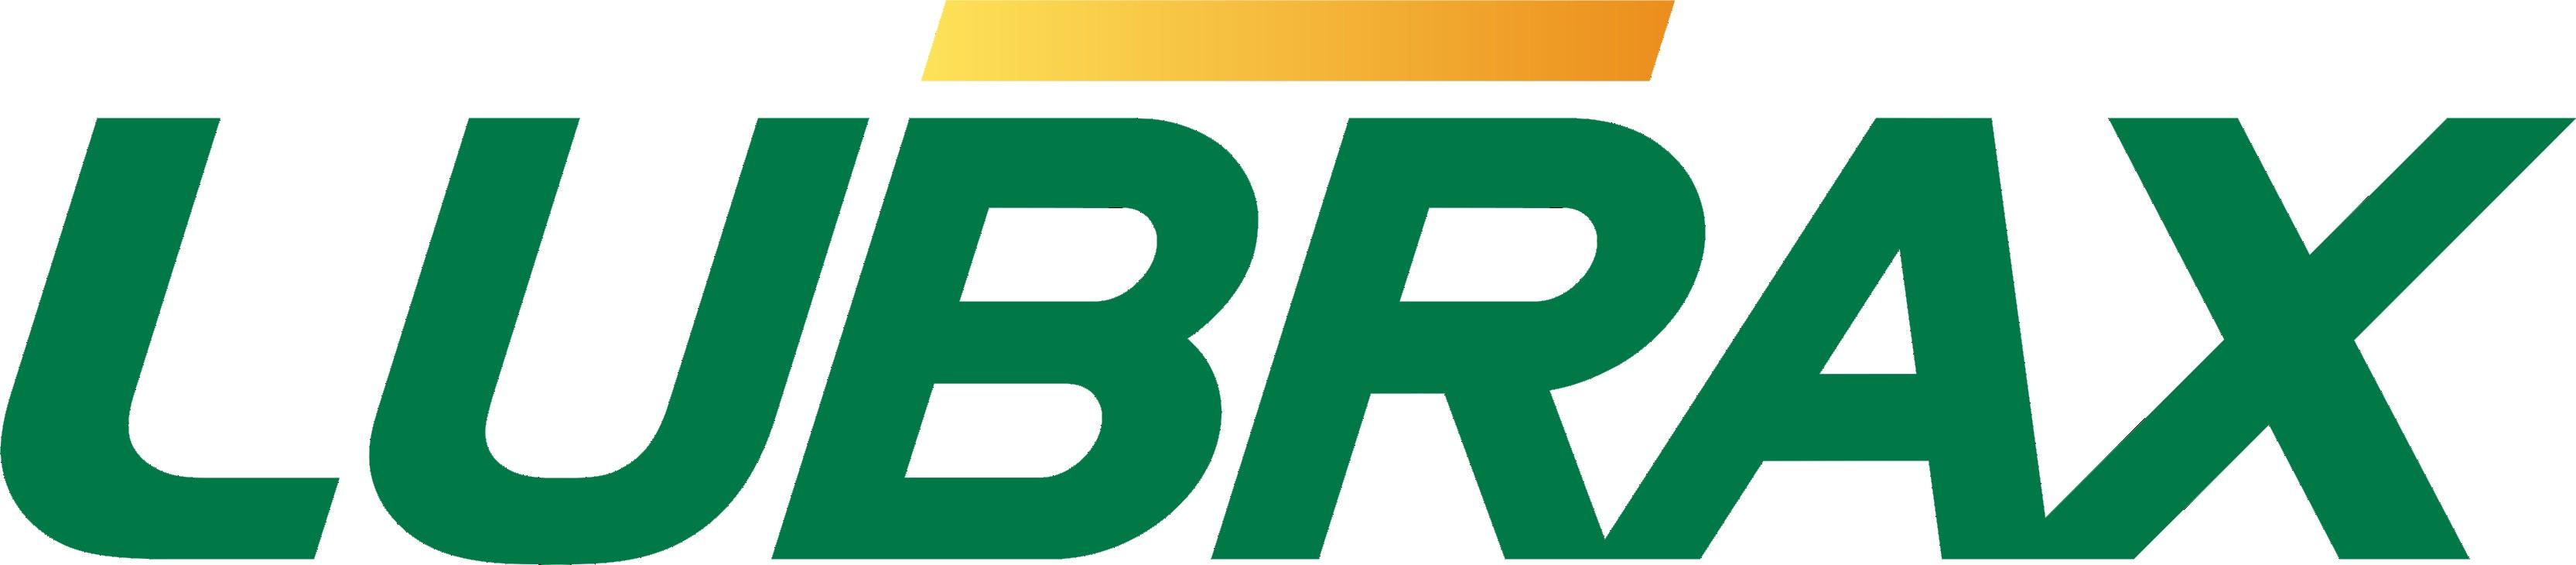 Calendario 2019 Brasil Br Más Recientes Stock Car Corridas torneio Pilotos Carros E Mais